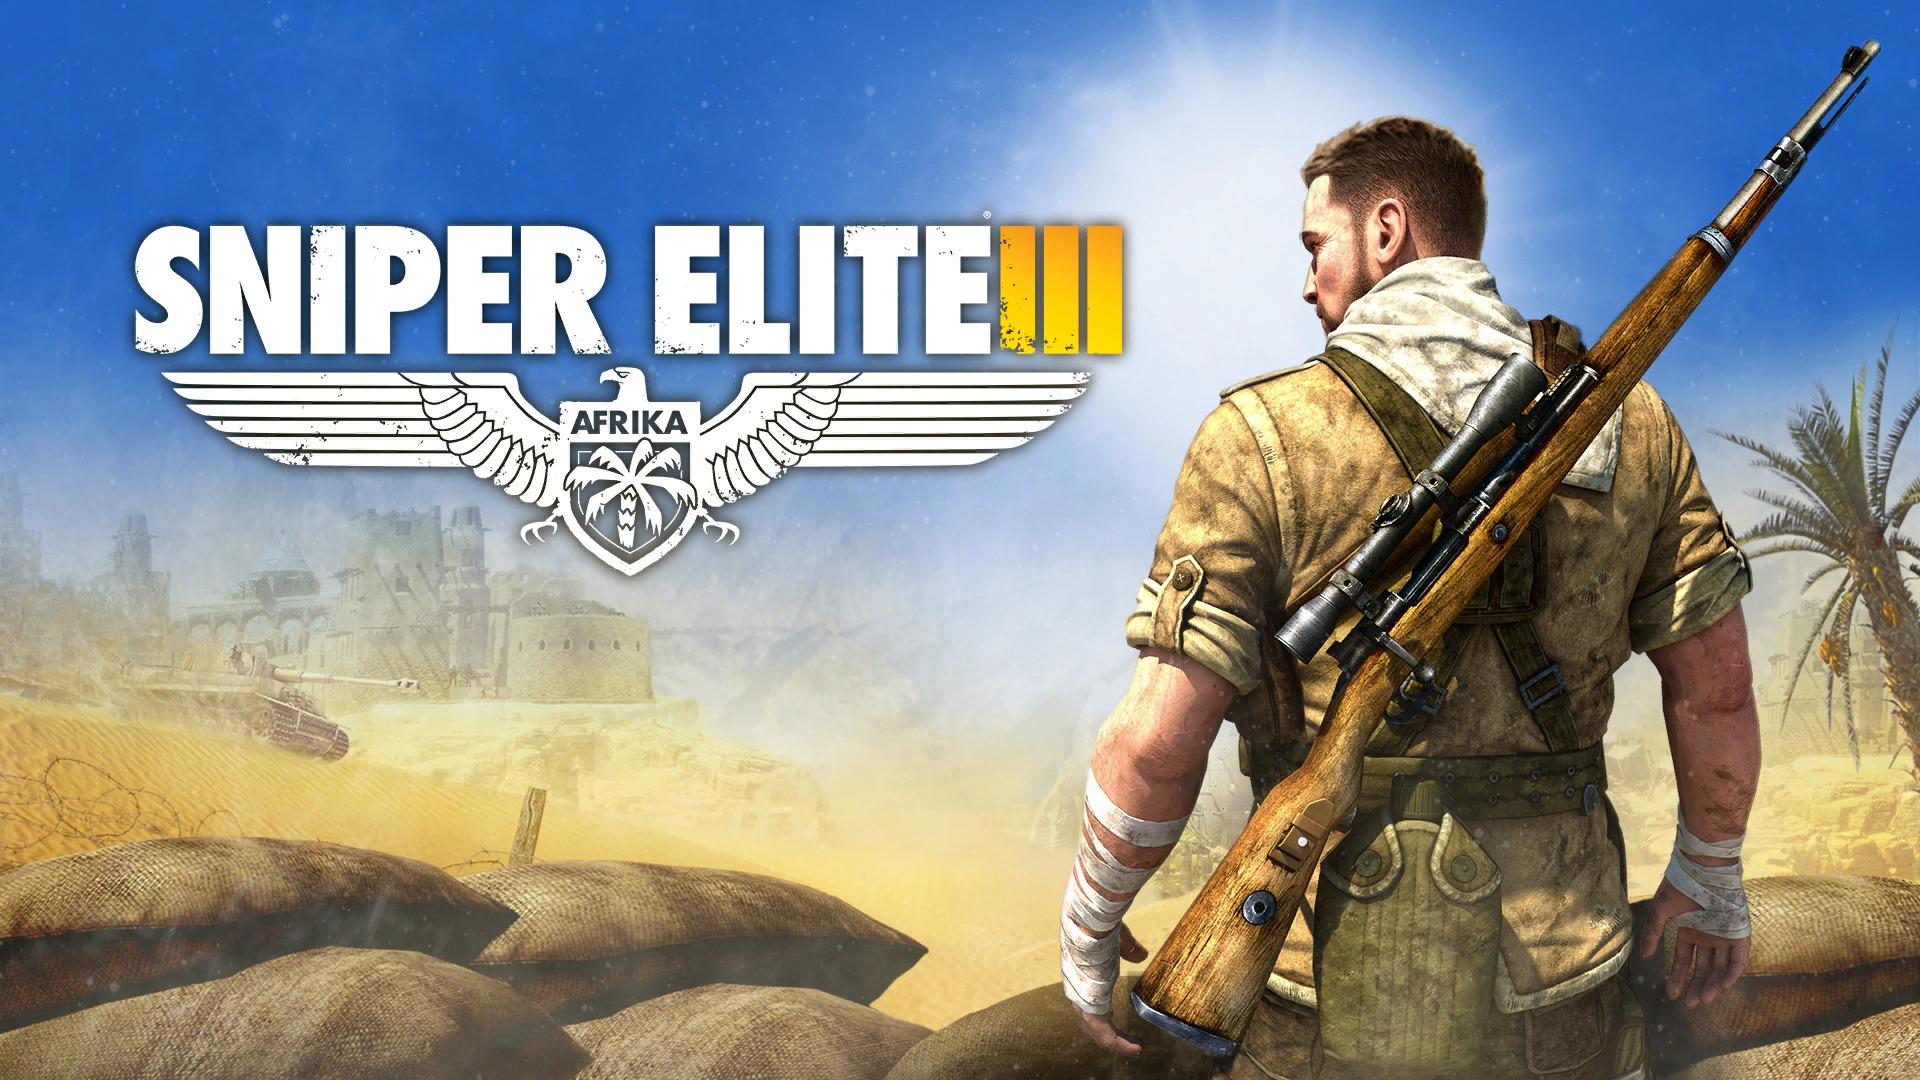 Sniper Elite 3 Wallpapers Full HD 6UFL441   4USkY 1920x1080